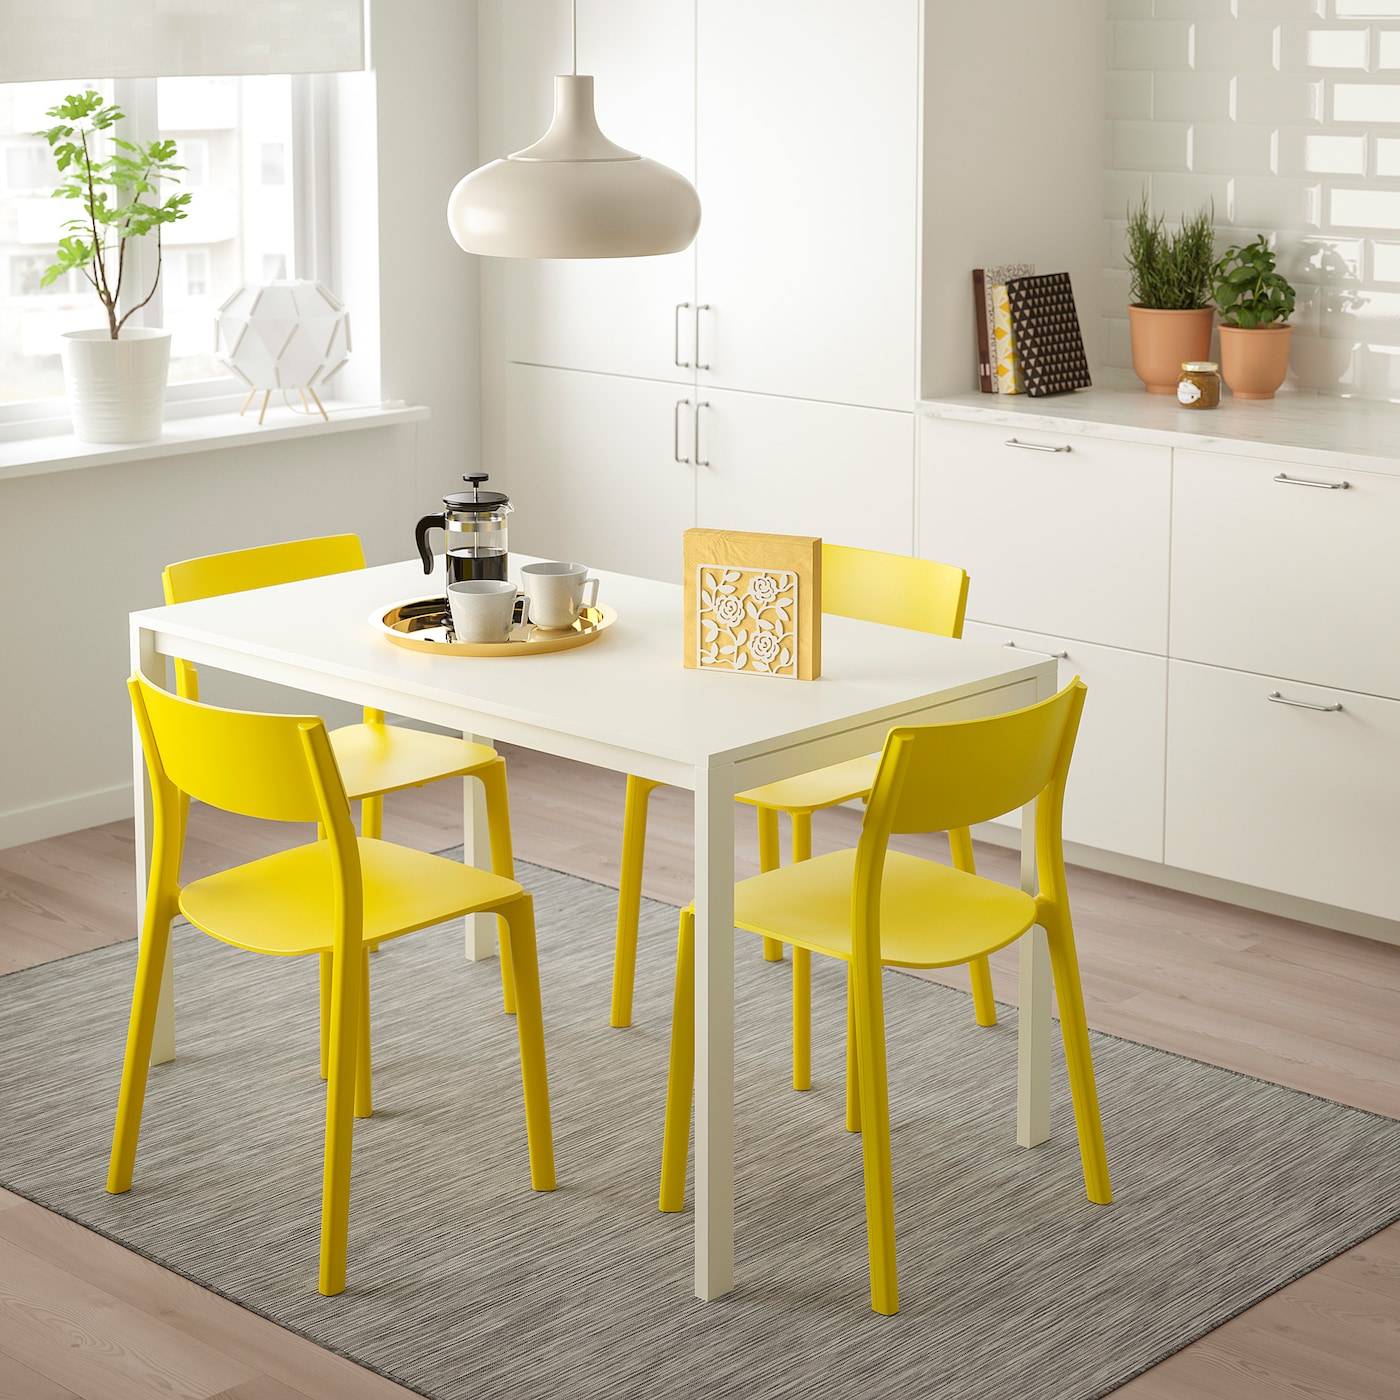 MELLTORP JANINGE Tavolo e 4 sedie bianco, giallo 125 cm